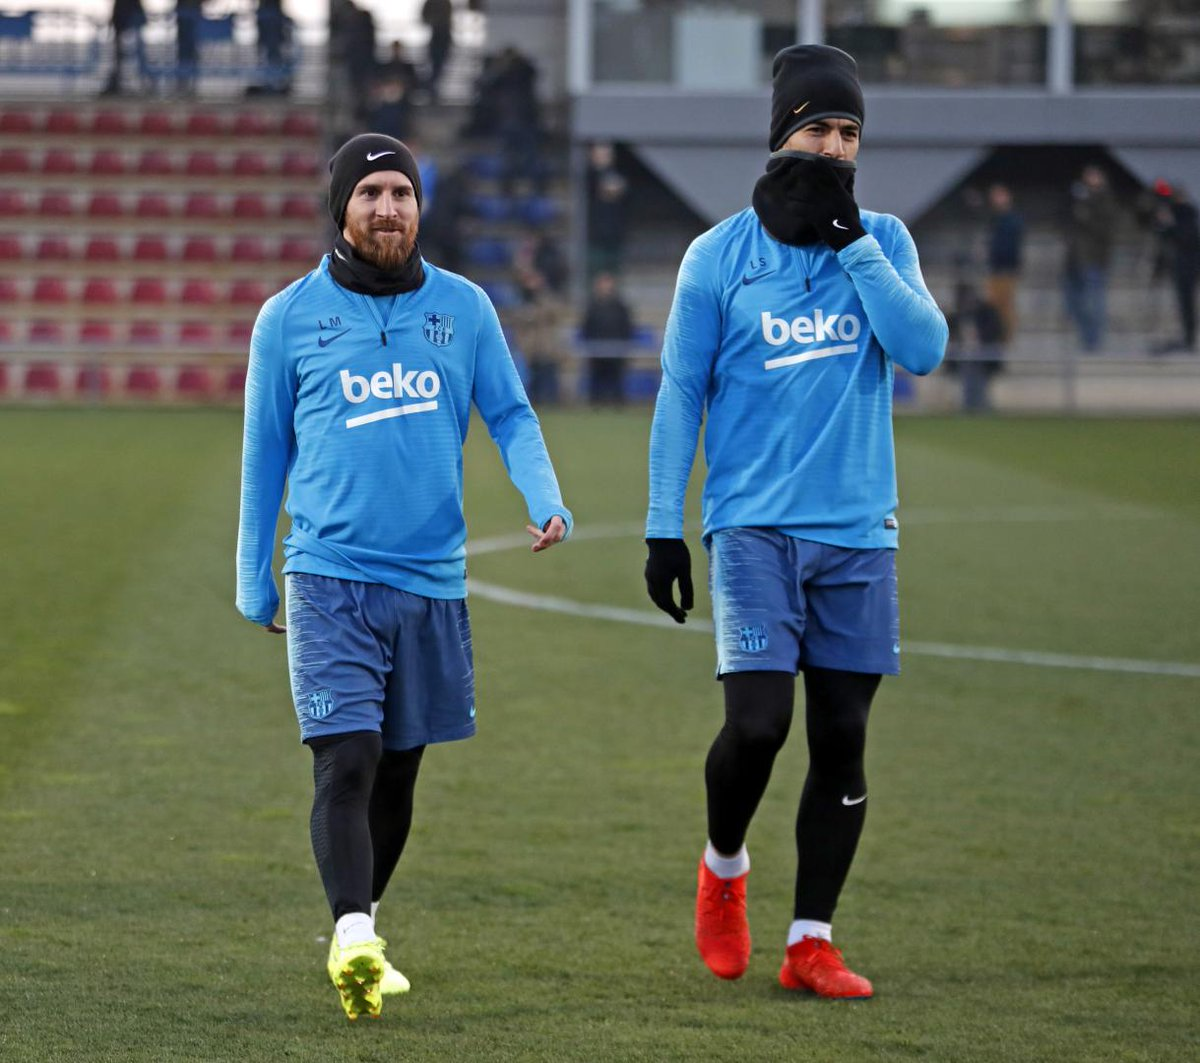 💪⚽ Getting ready for @Athletic_en  🔵🔴 #ForçaBarça